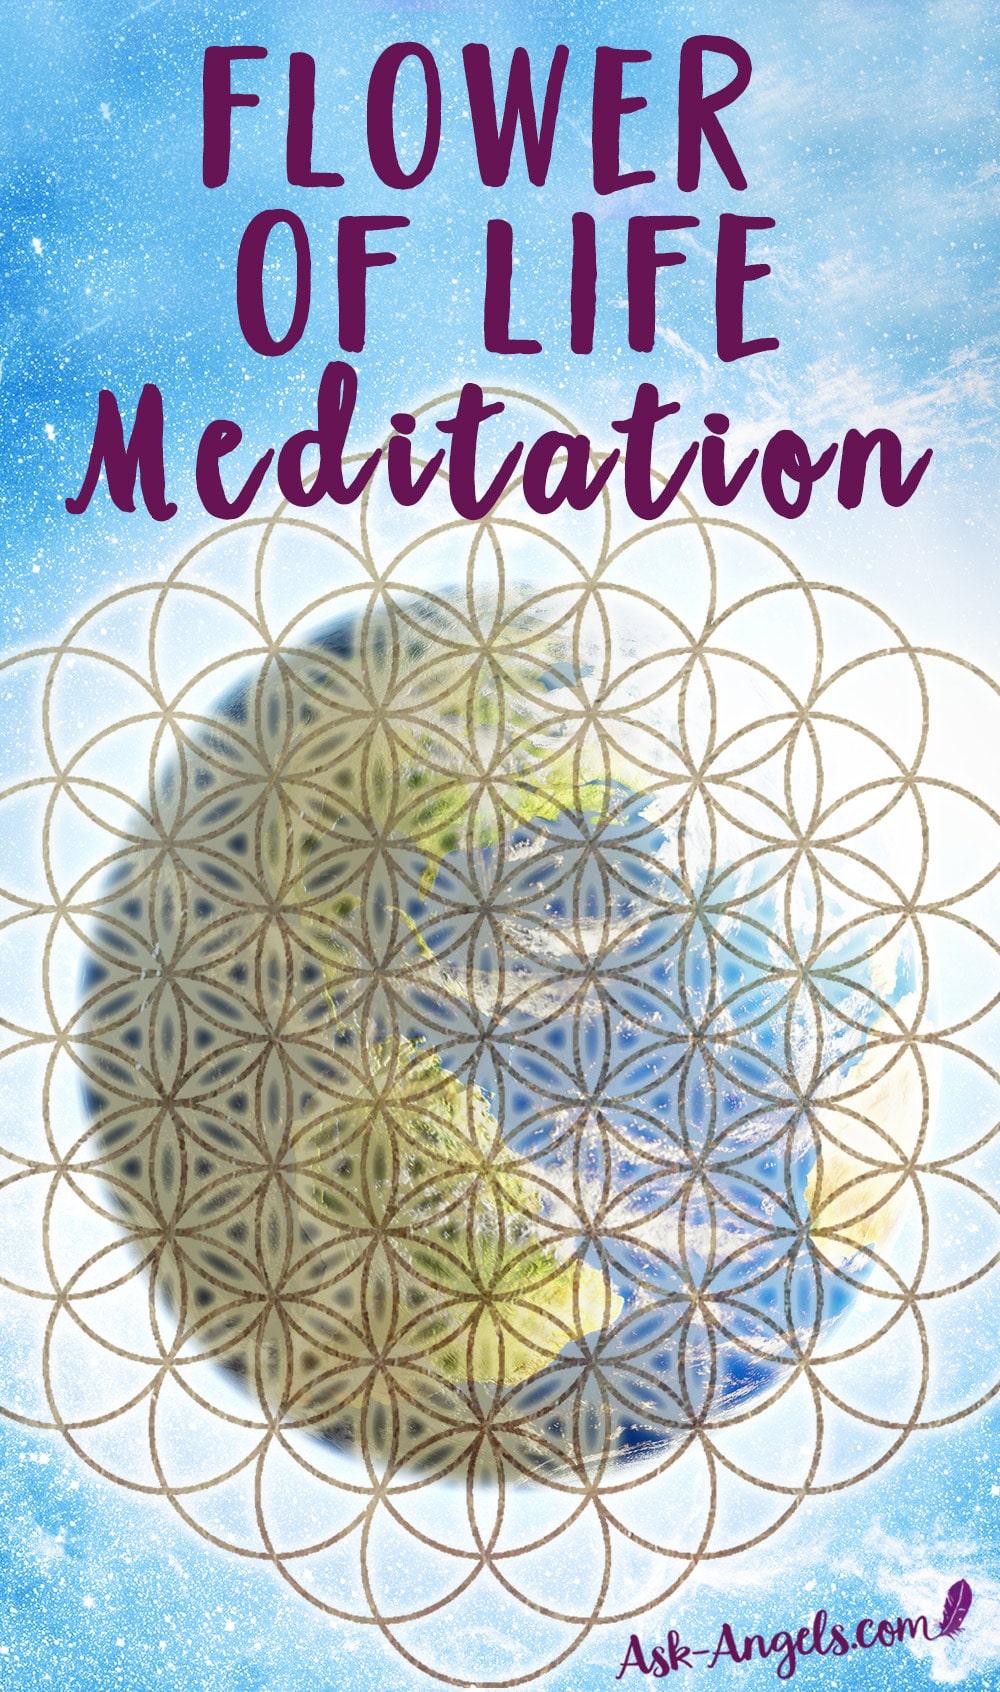 Flower of Life Meditation